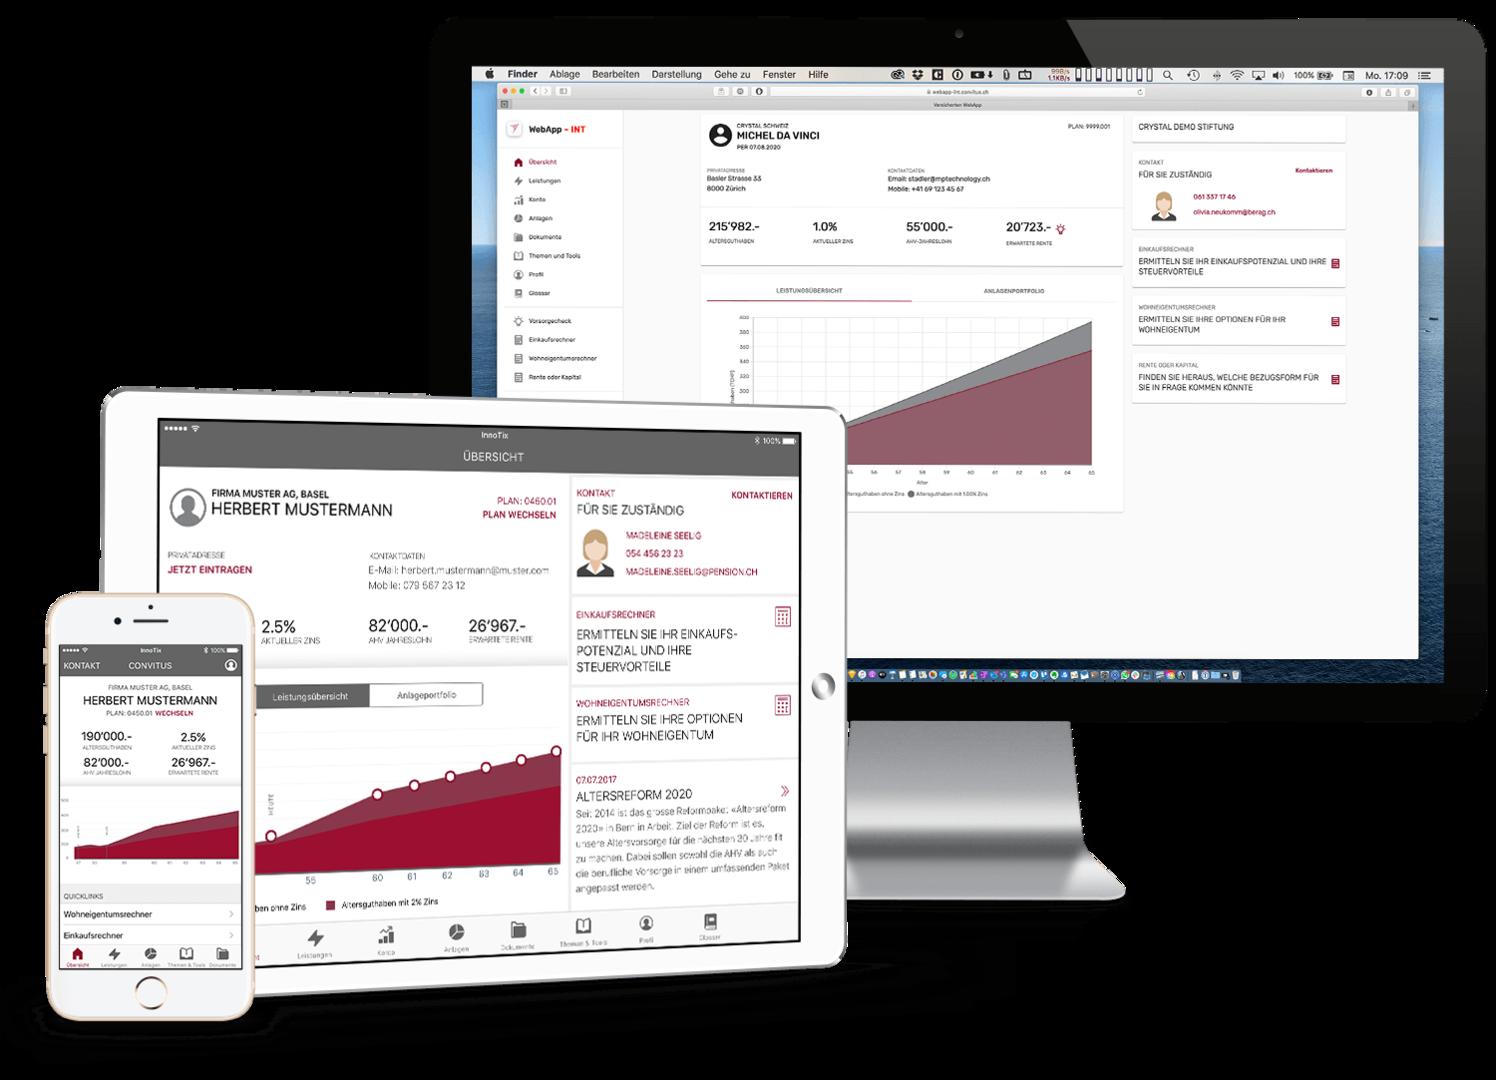 Convitus_Versicherten_App_Welt_web_transparent.png